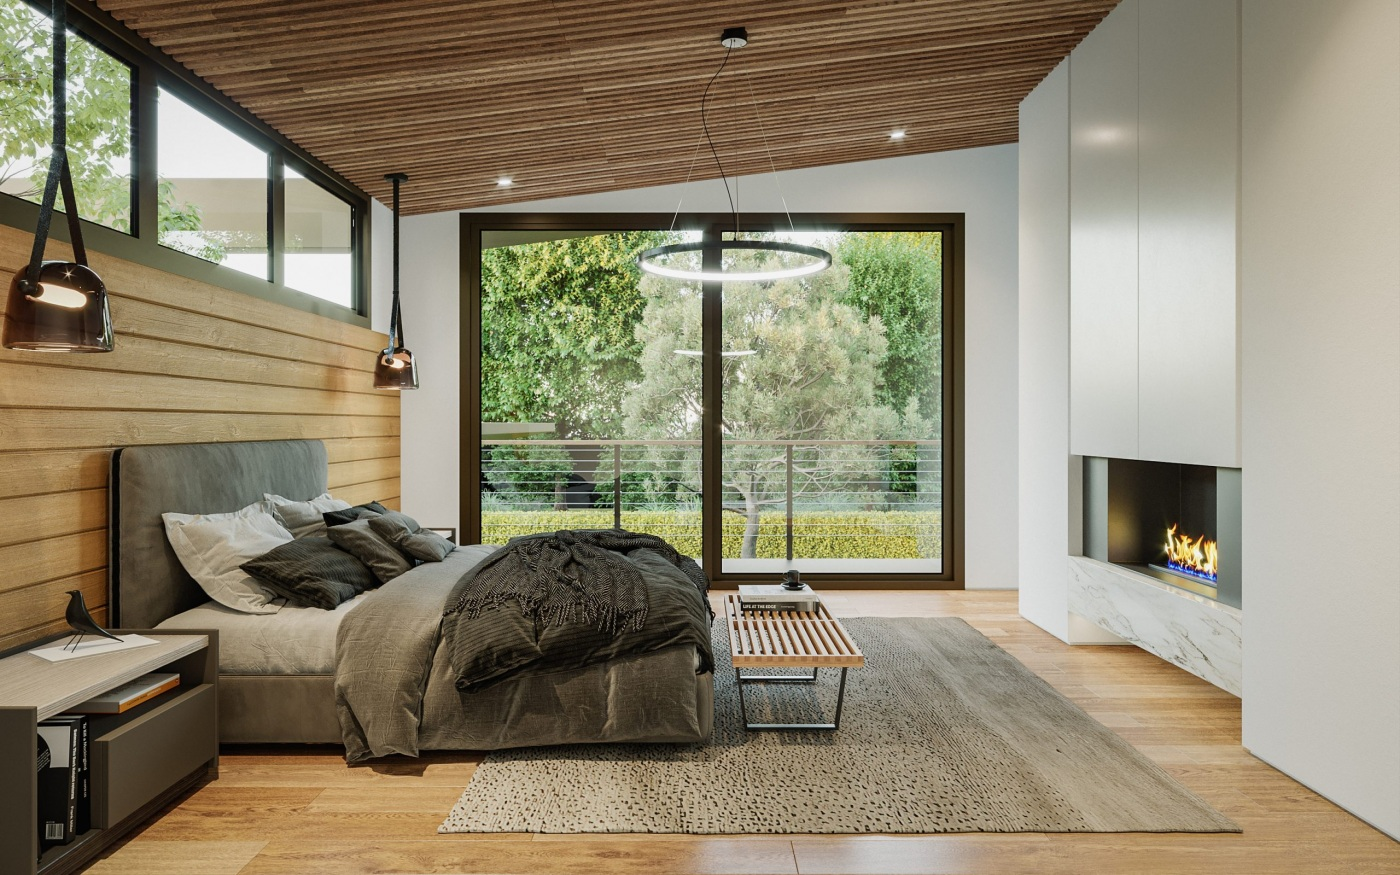 SC_Interior_Bedroom001-scaled